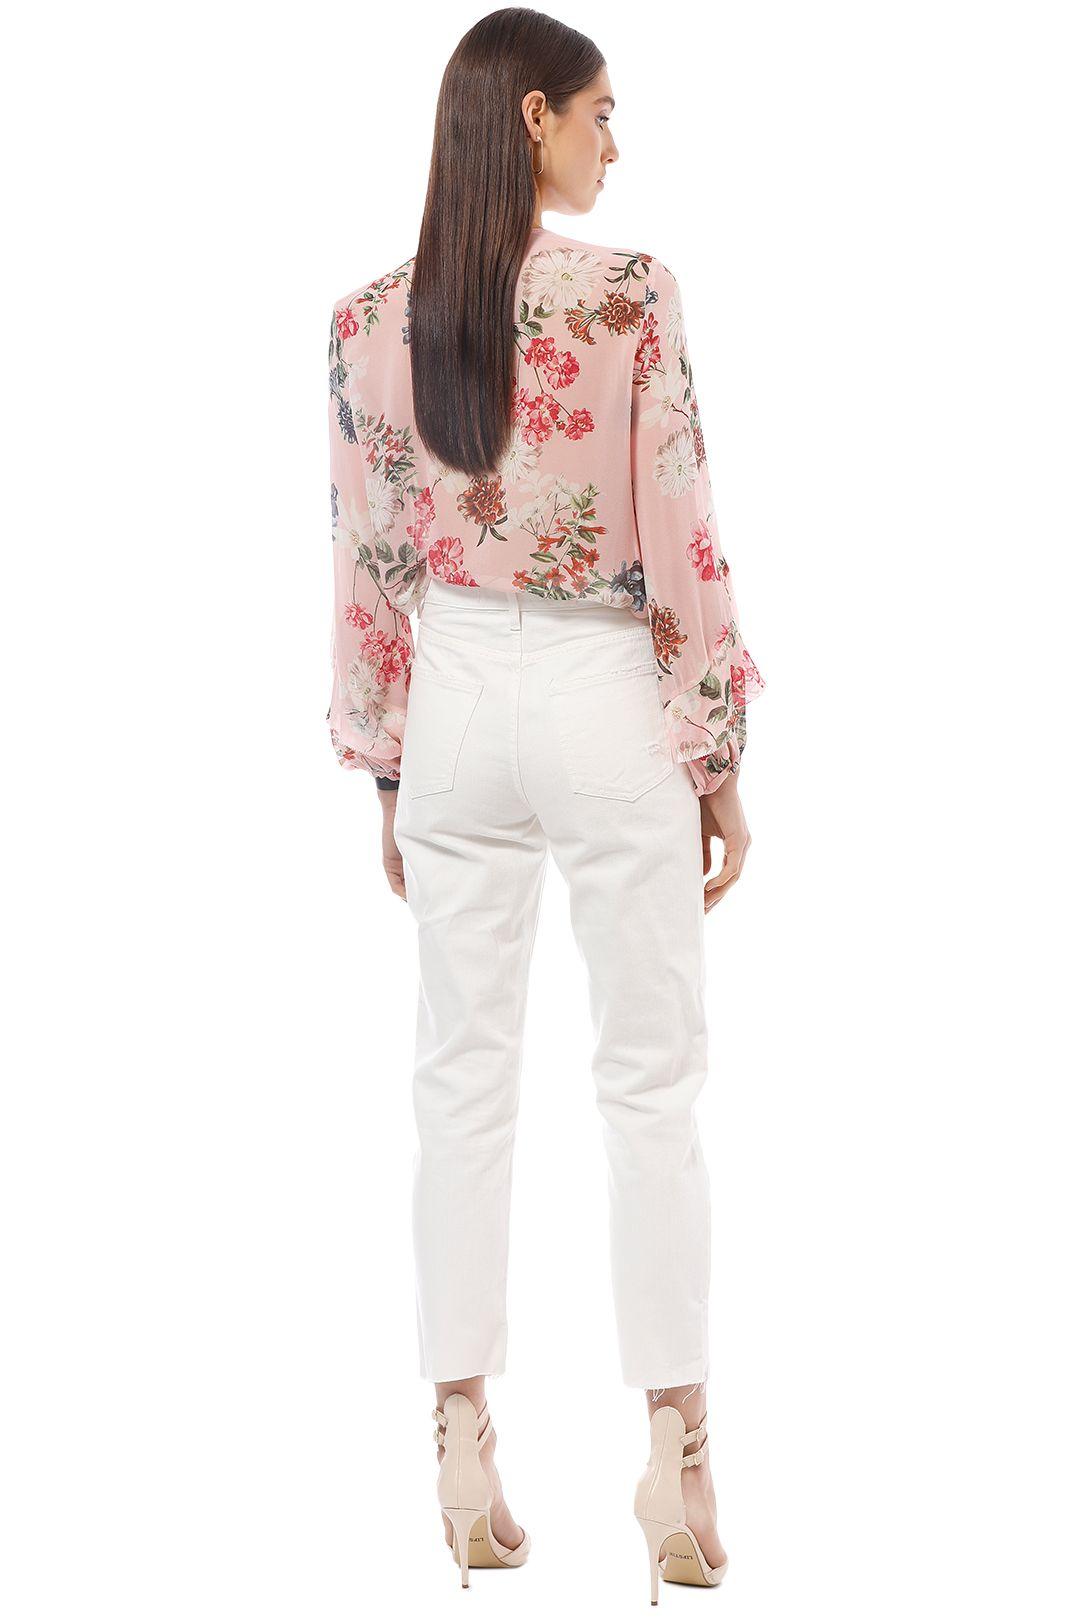 Nicholas the Label - Lilac Floral Yoke Blouse - Pink - Back